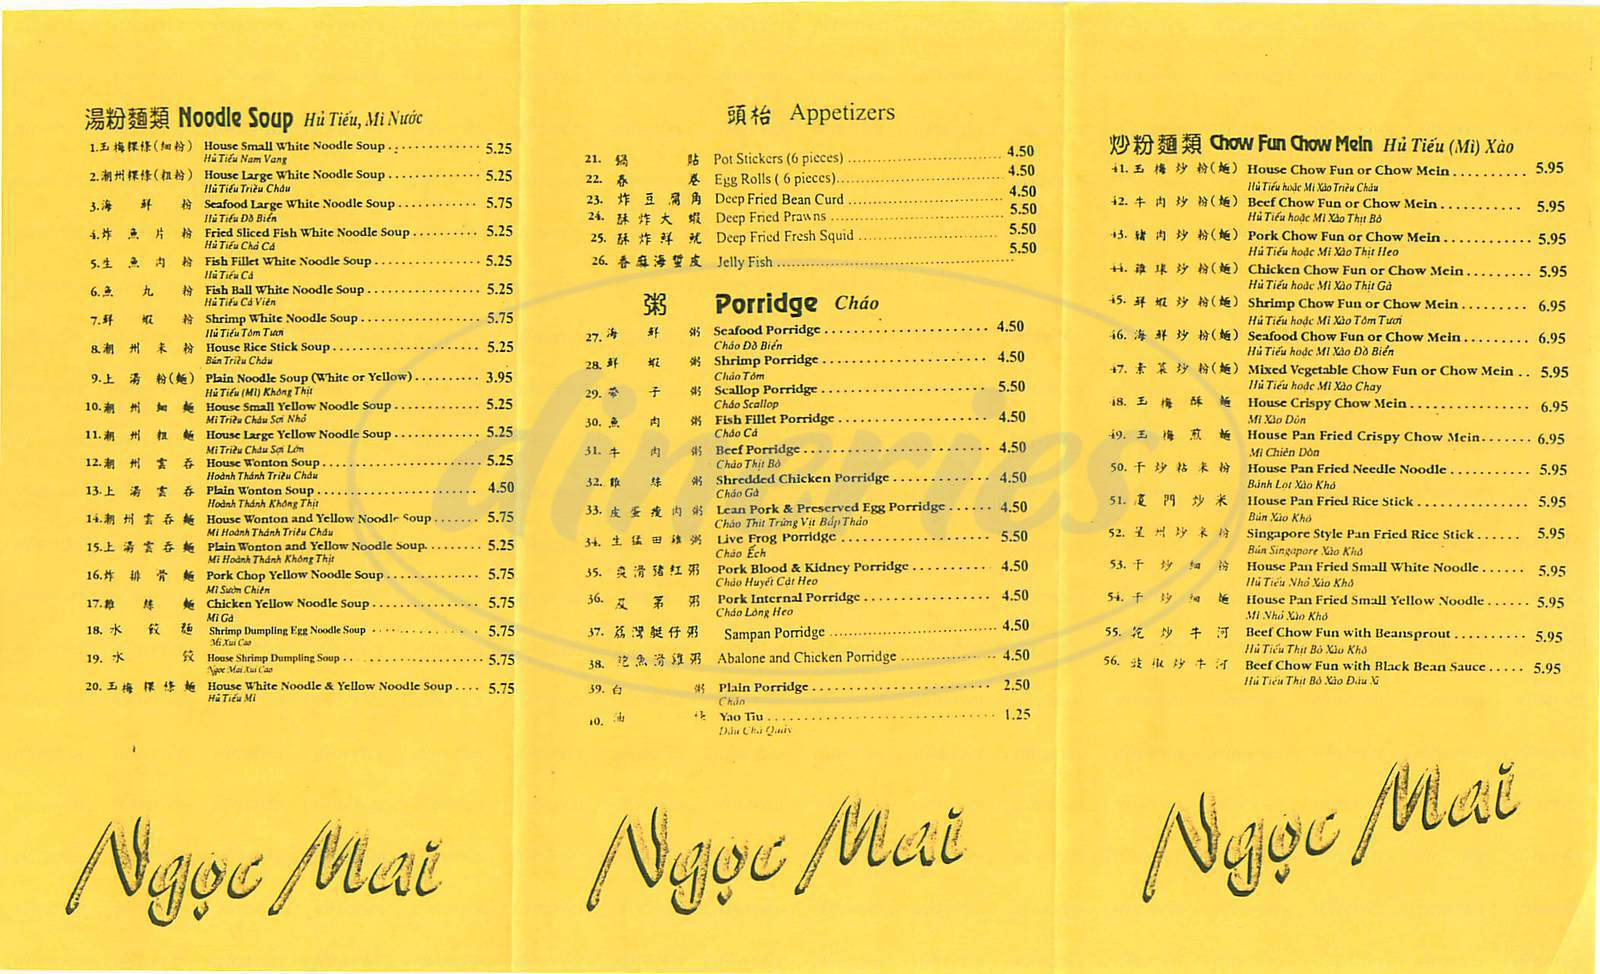 menu for Ngoc Mai Restaurant